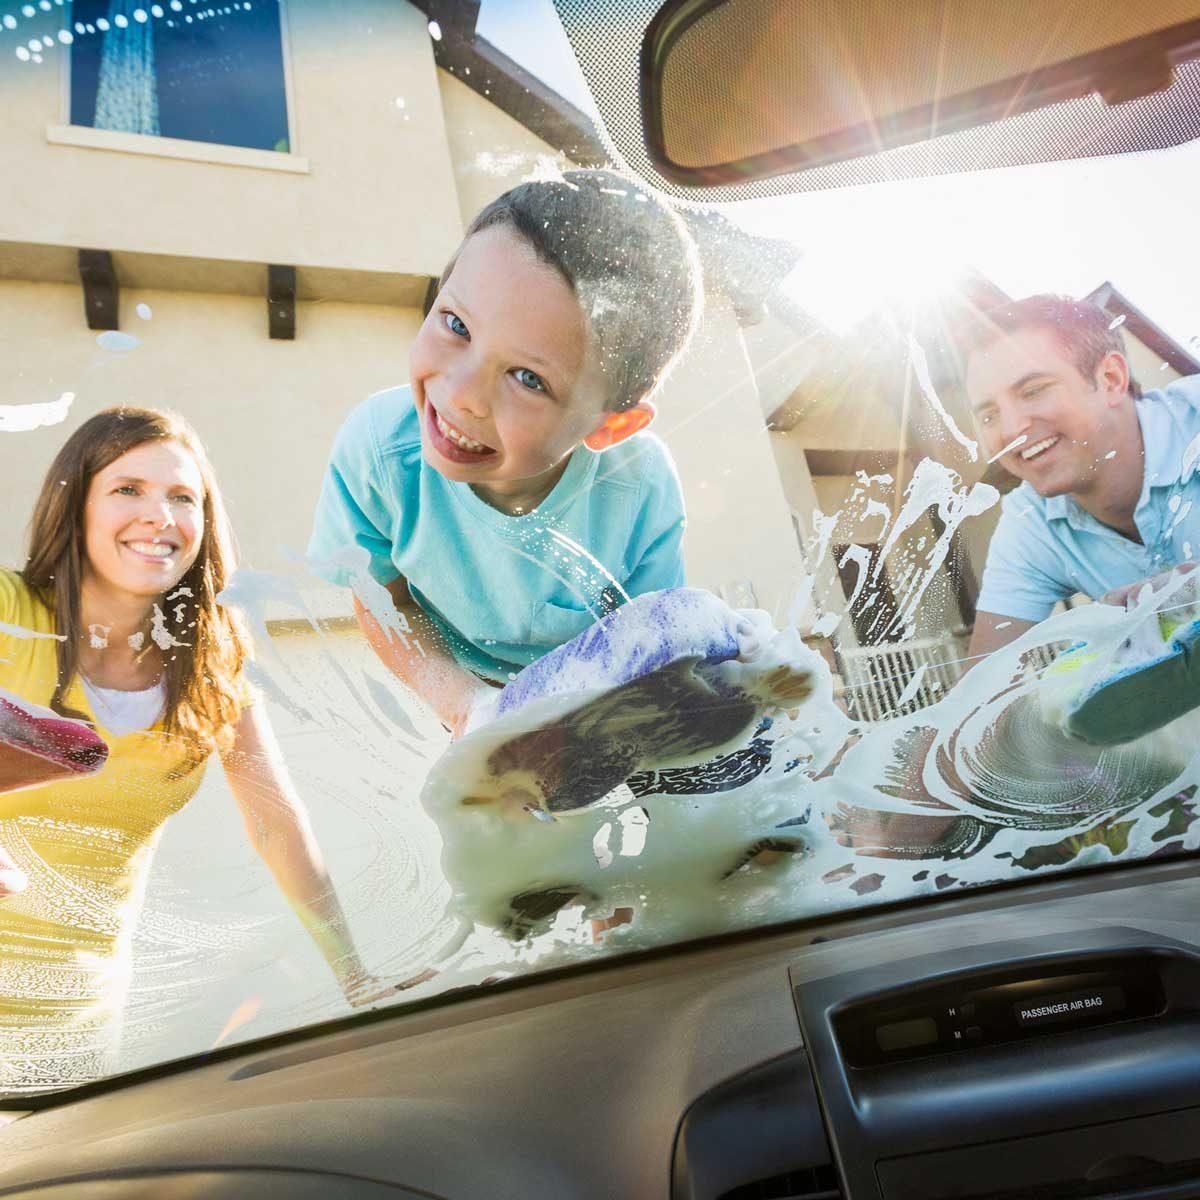 Family washing a car